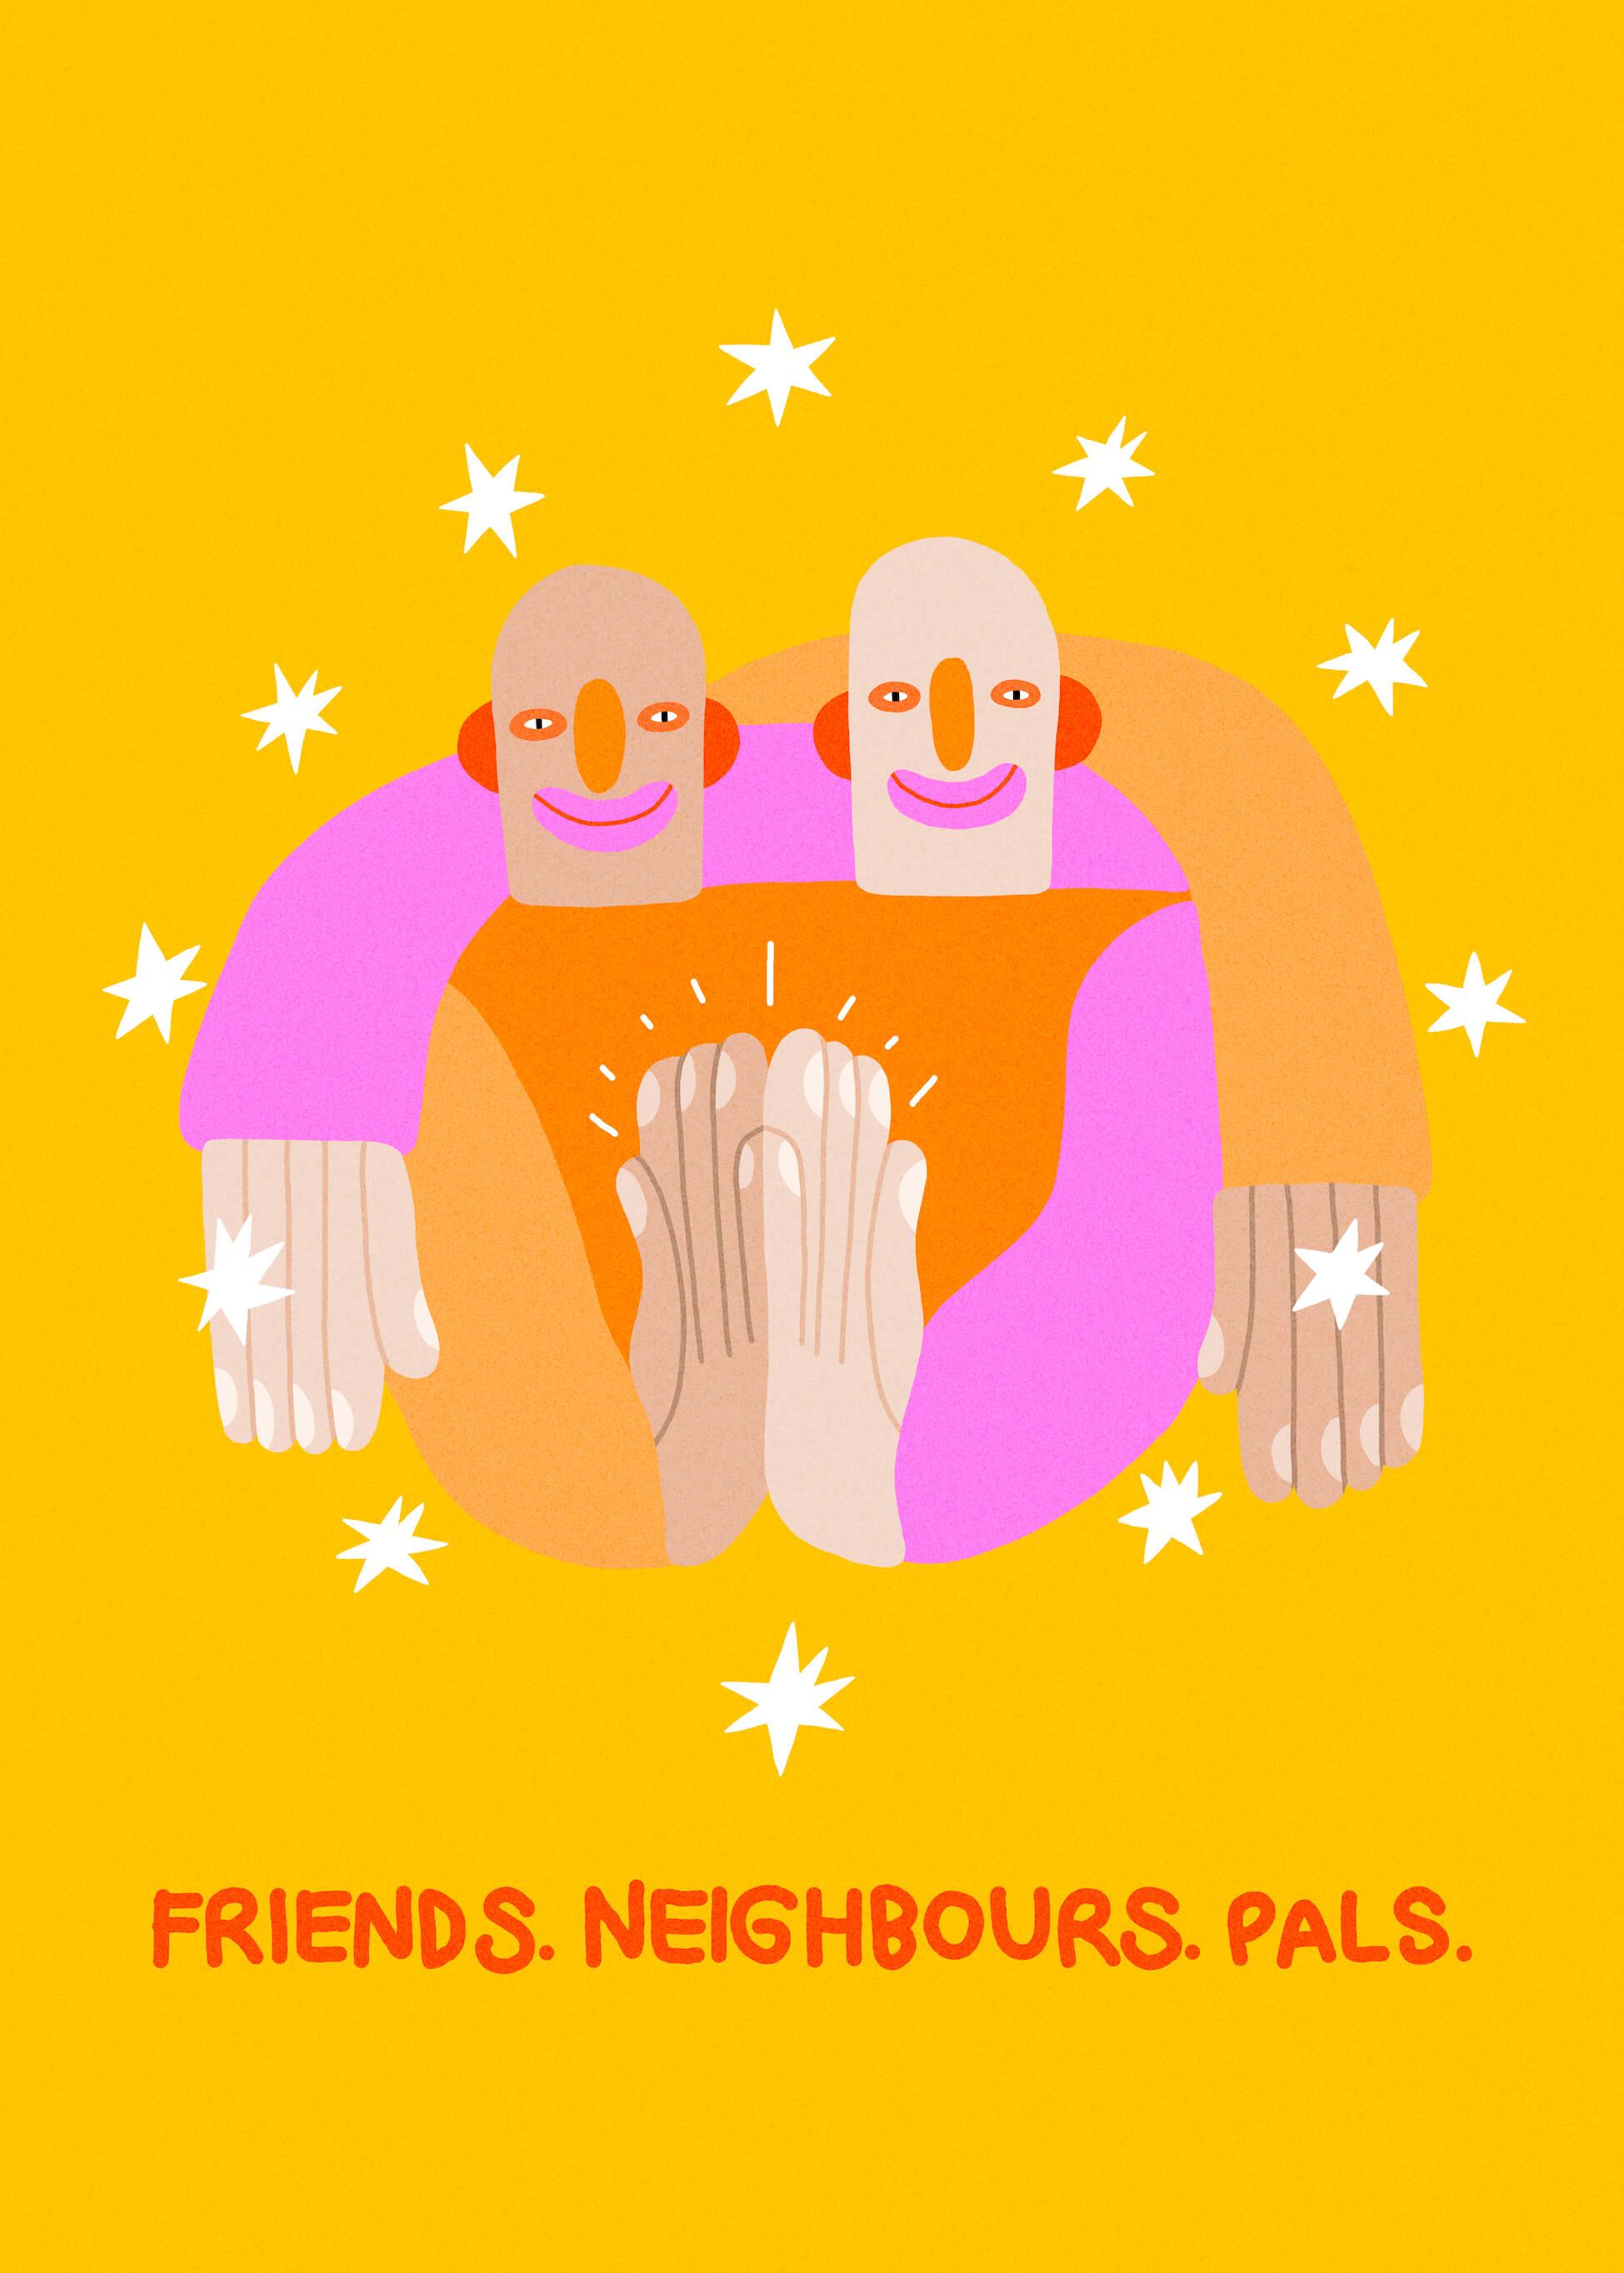 Friends. Neighbours. Pals main image